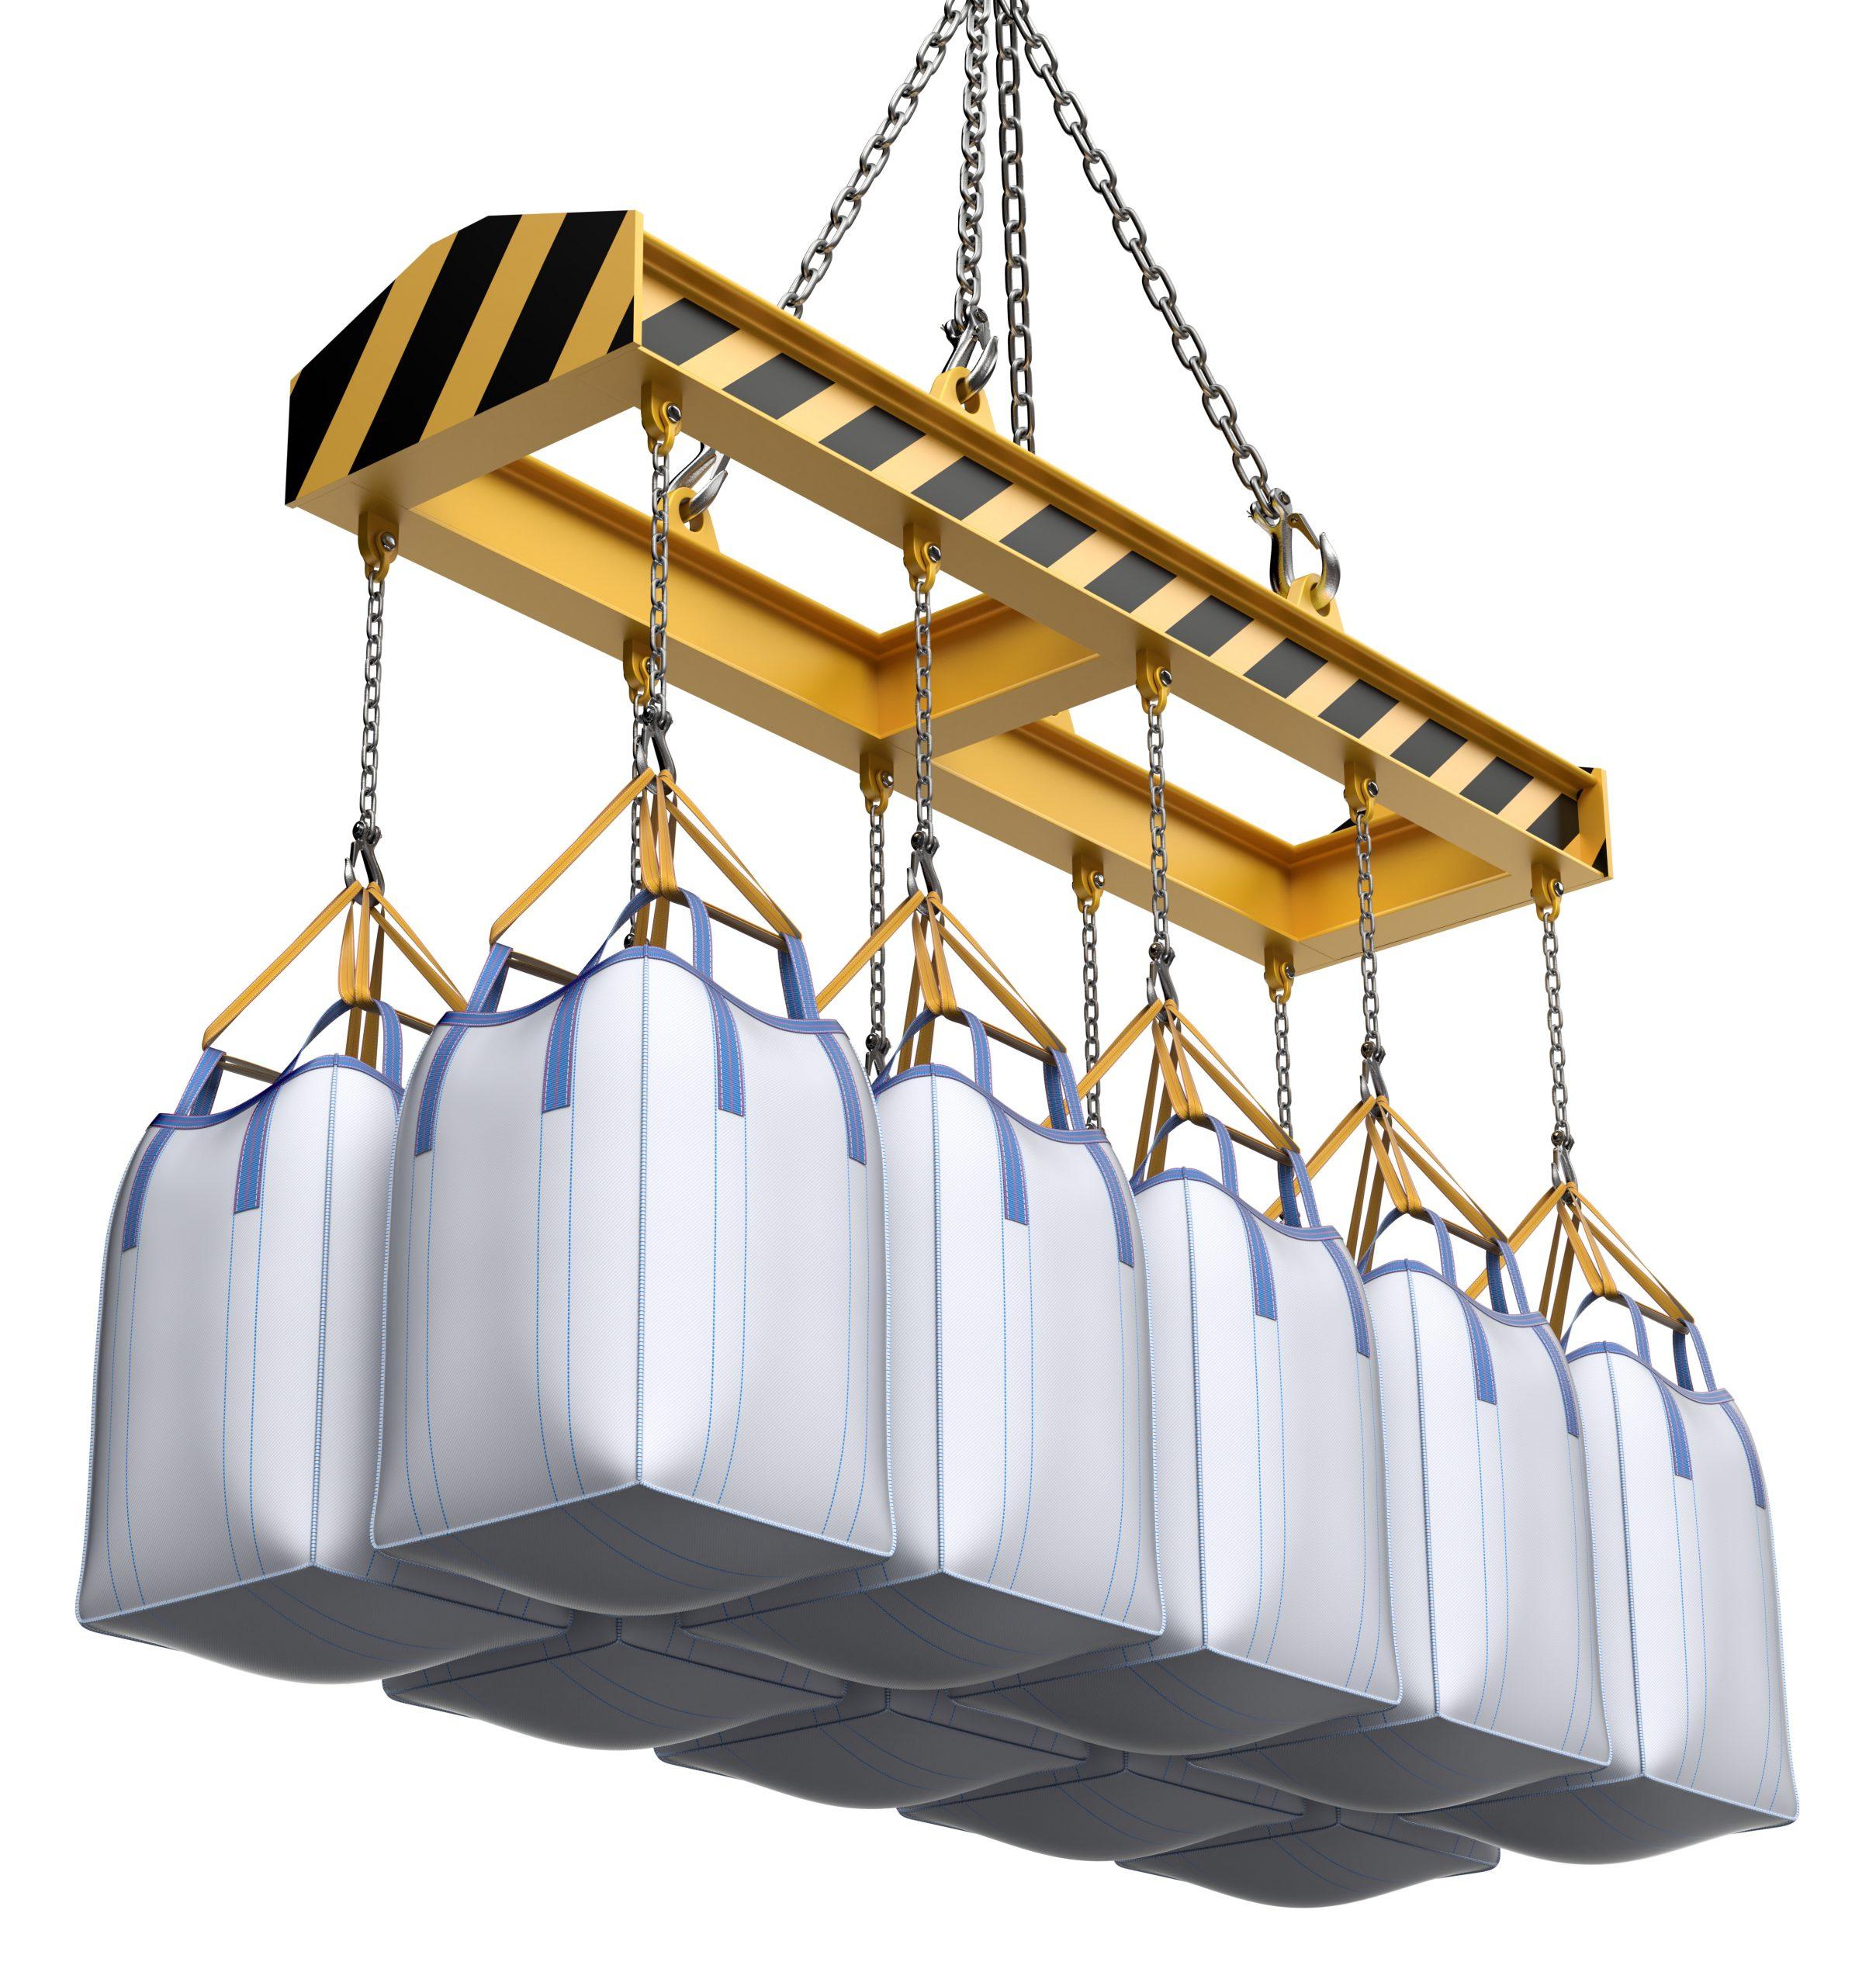 Jumbo Bags Suppliers